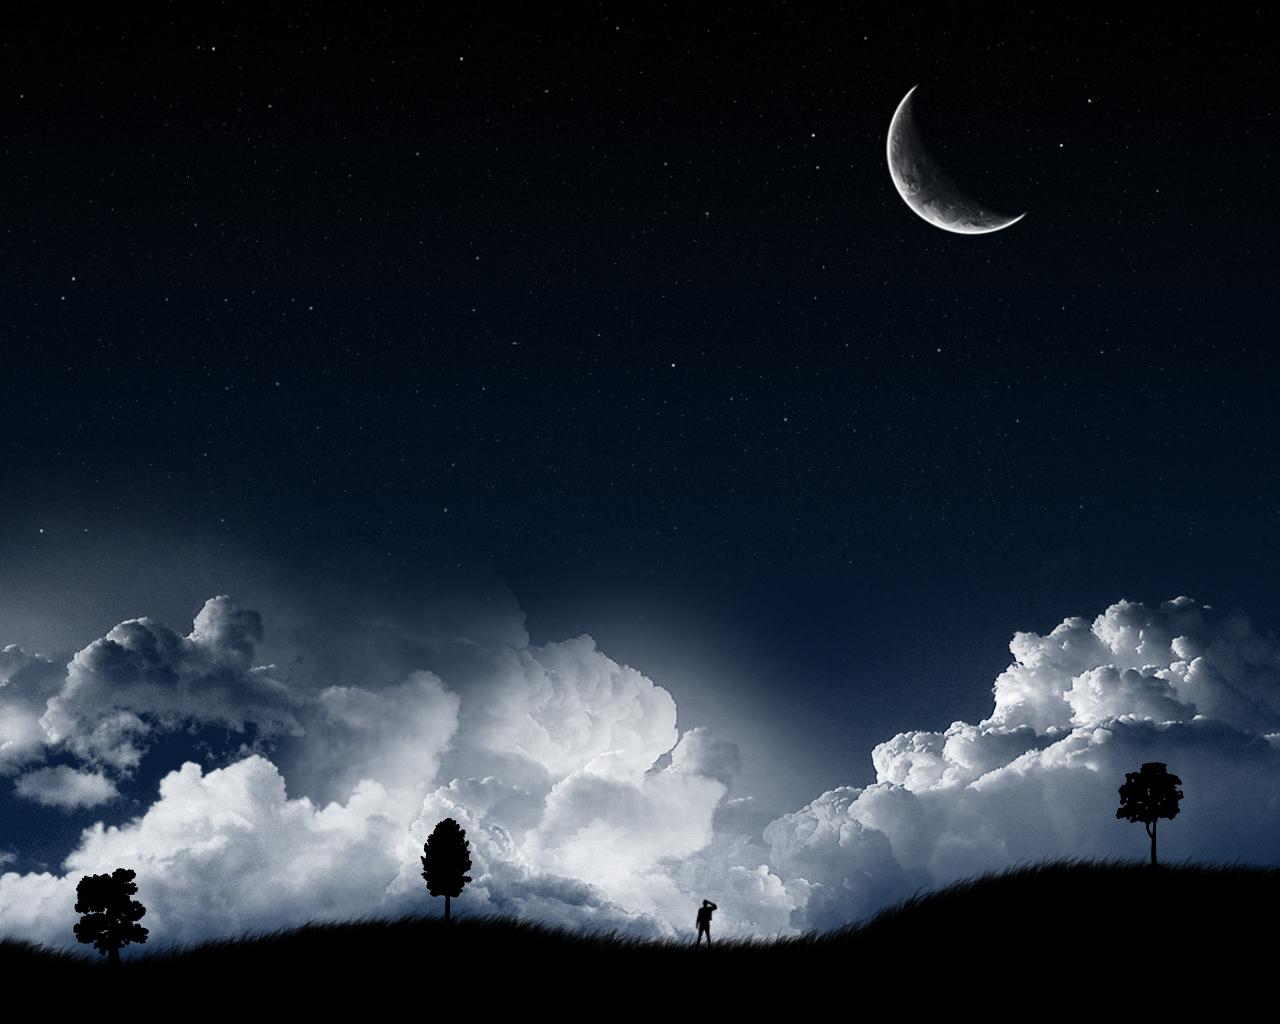 Motivasi Islam Kata Kata Bijak Di Malam Hari Yang Sunyi